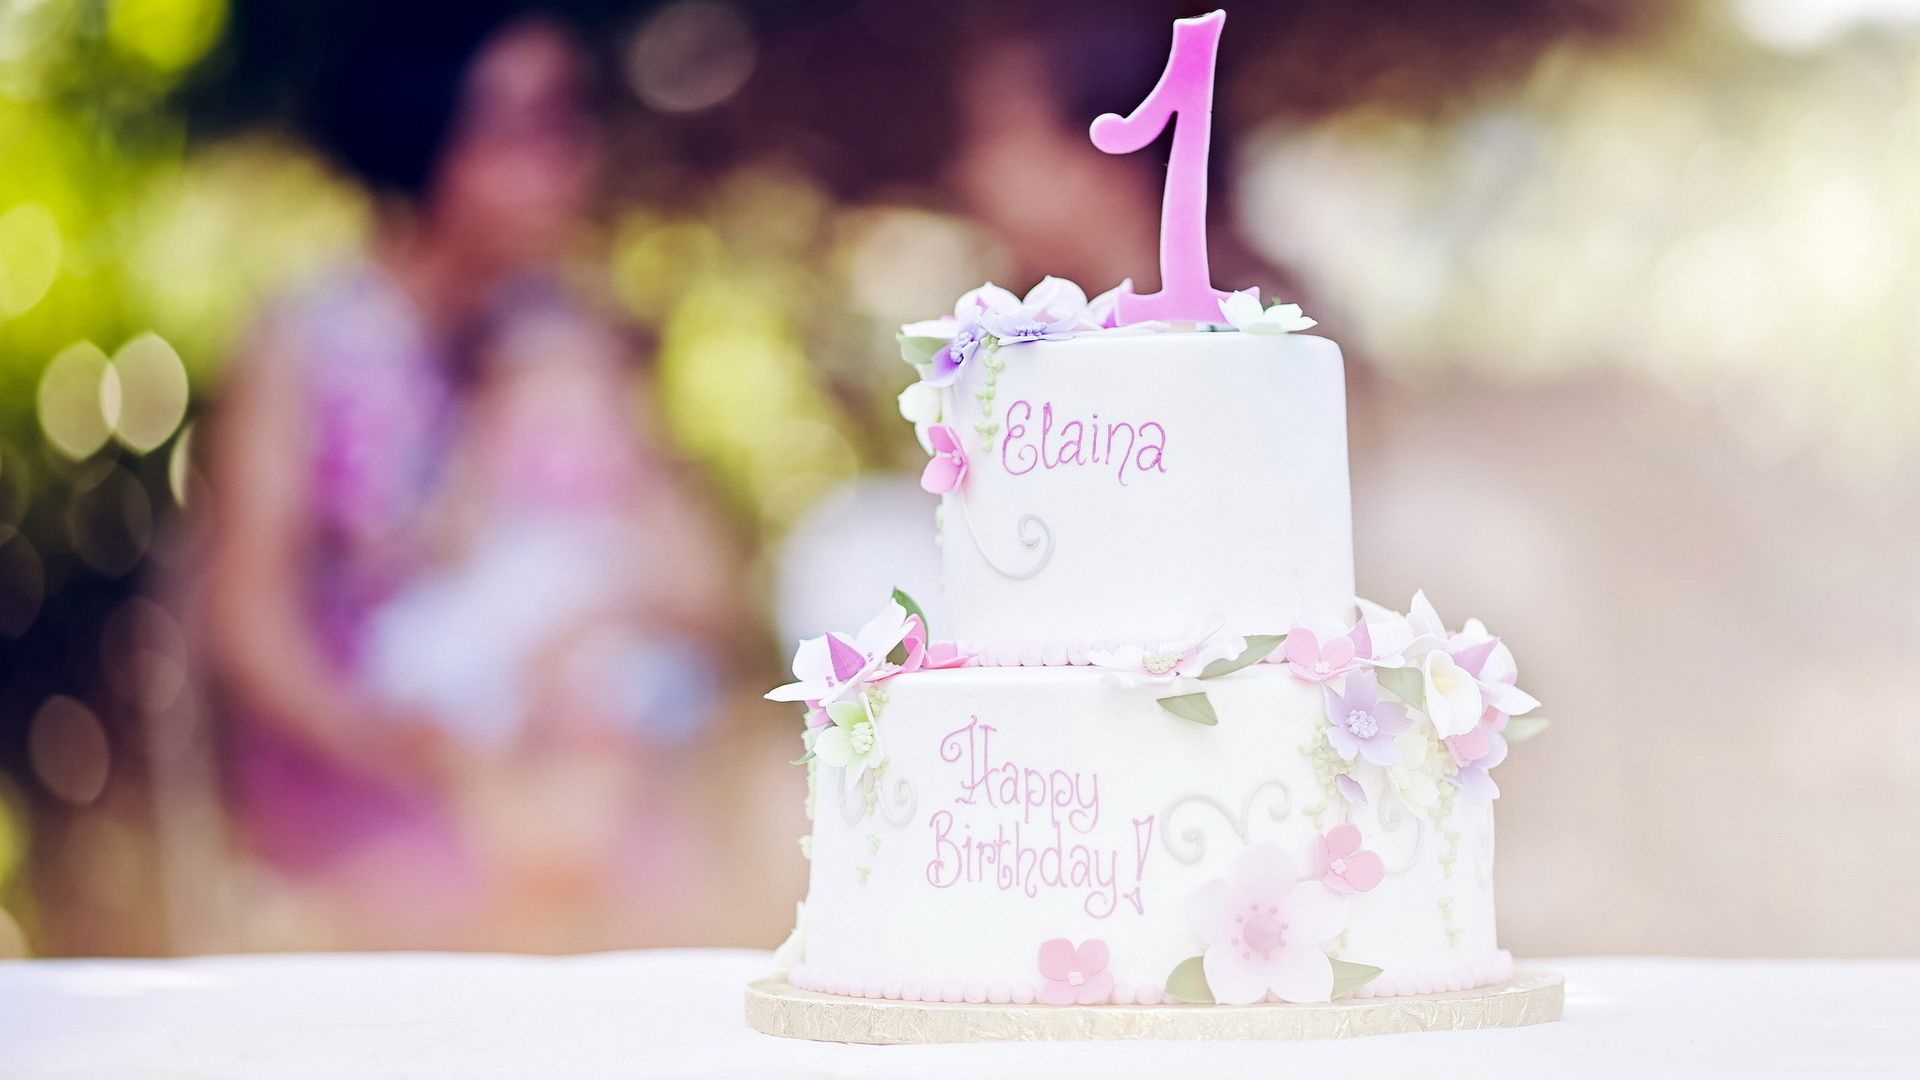 Birthday Cake screen wallpaper